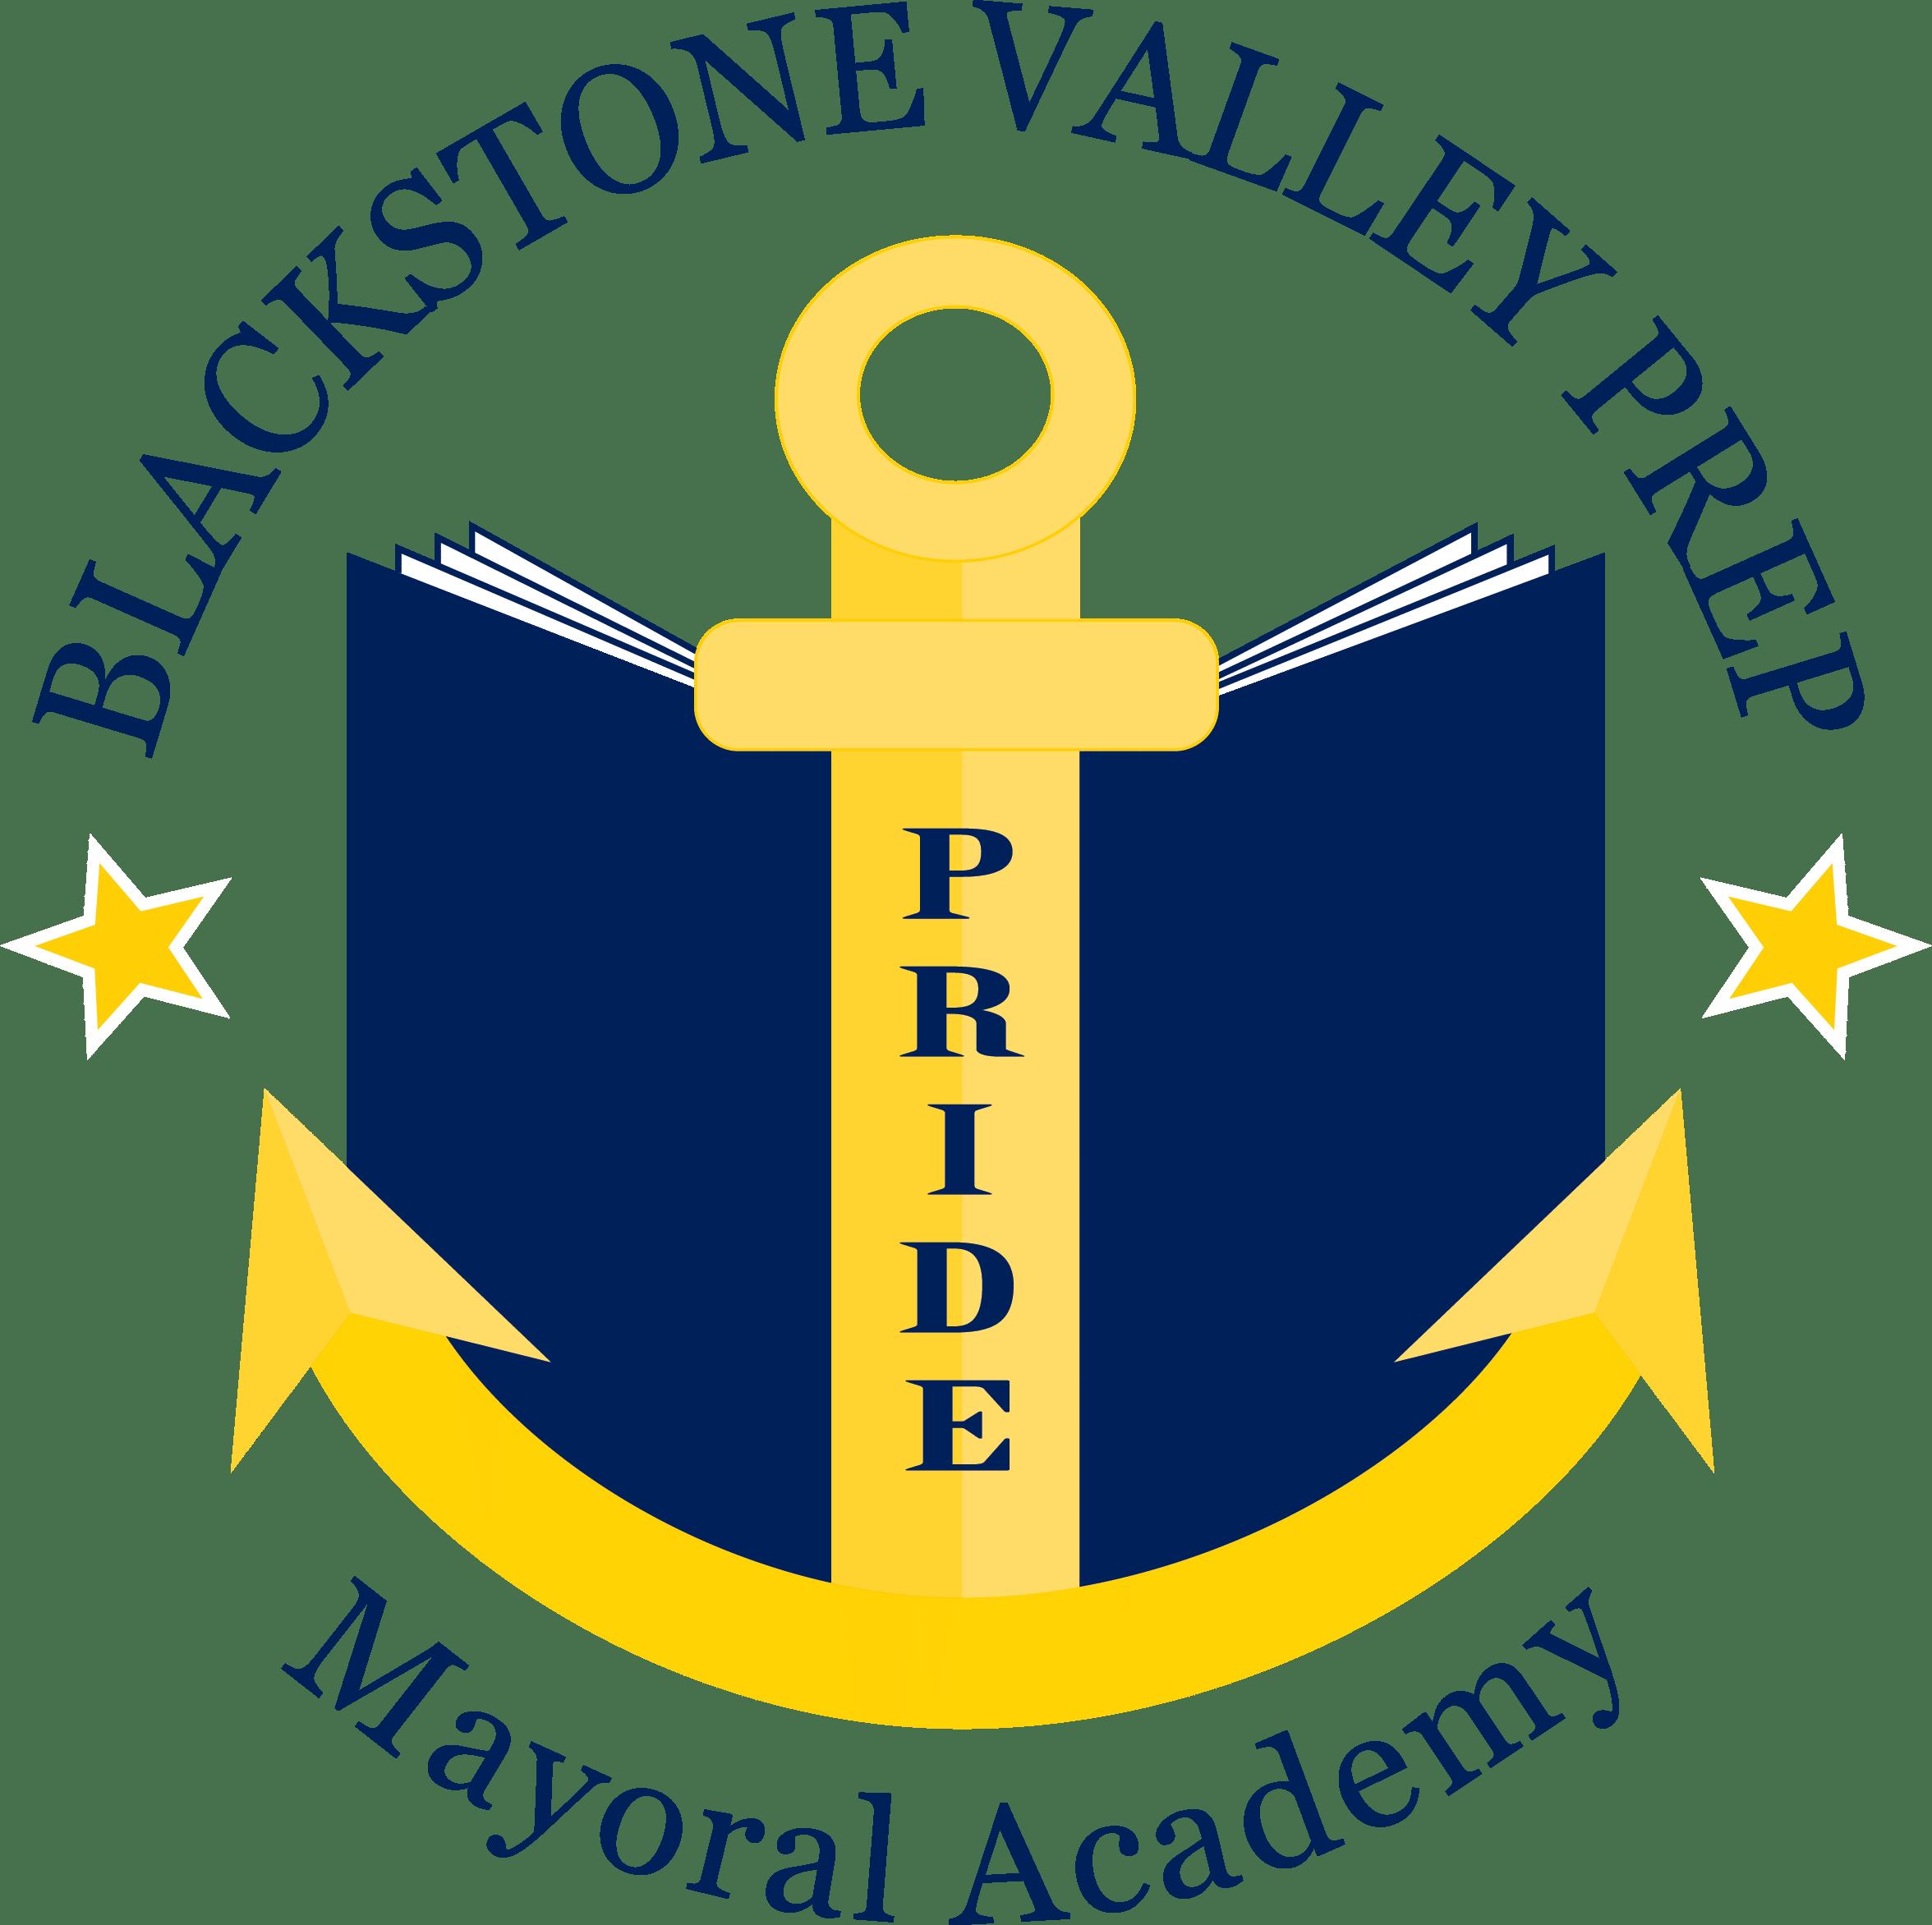 Blackstone Valley Prep Mayoral Academy Logo